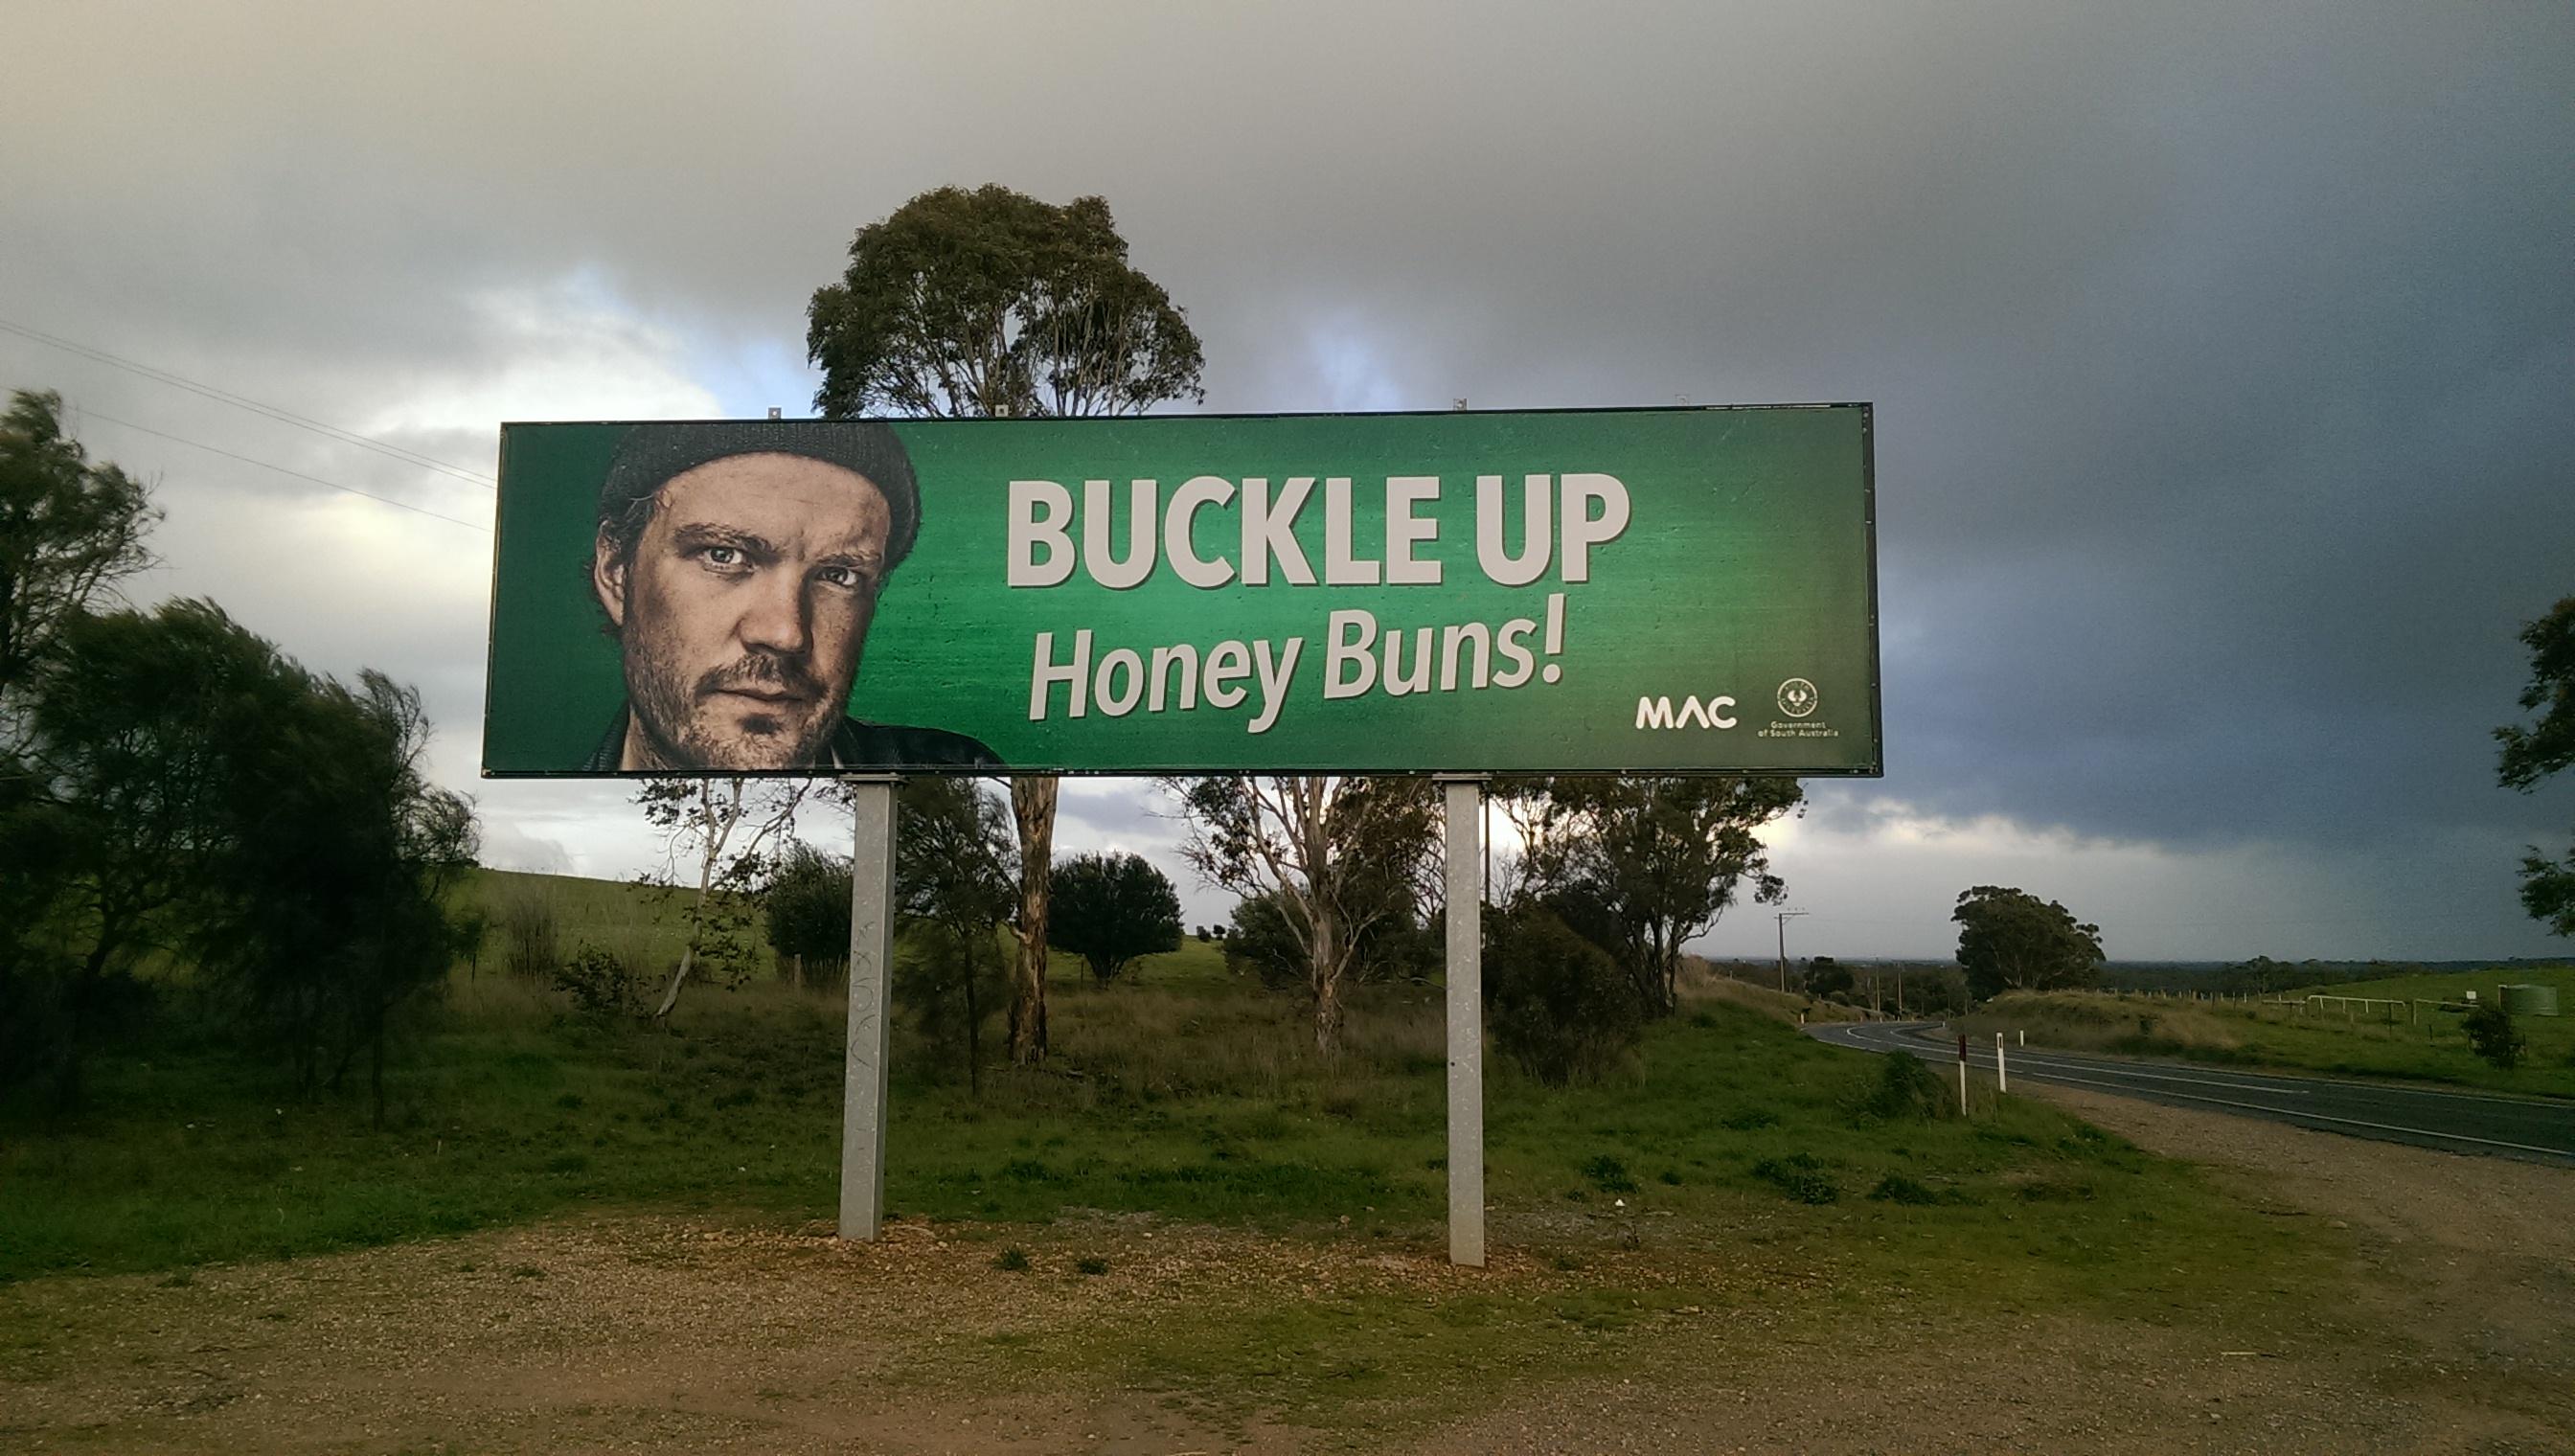 #Adelaide Hills